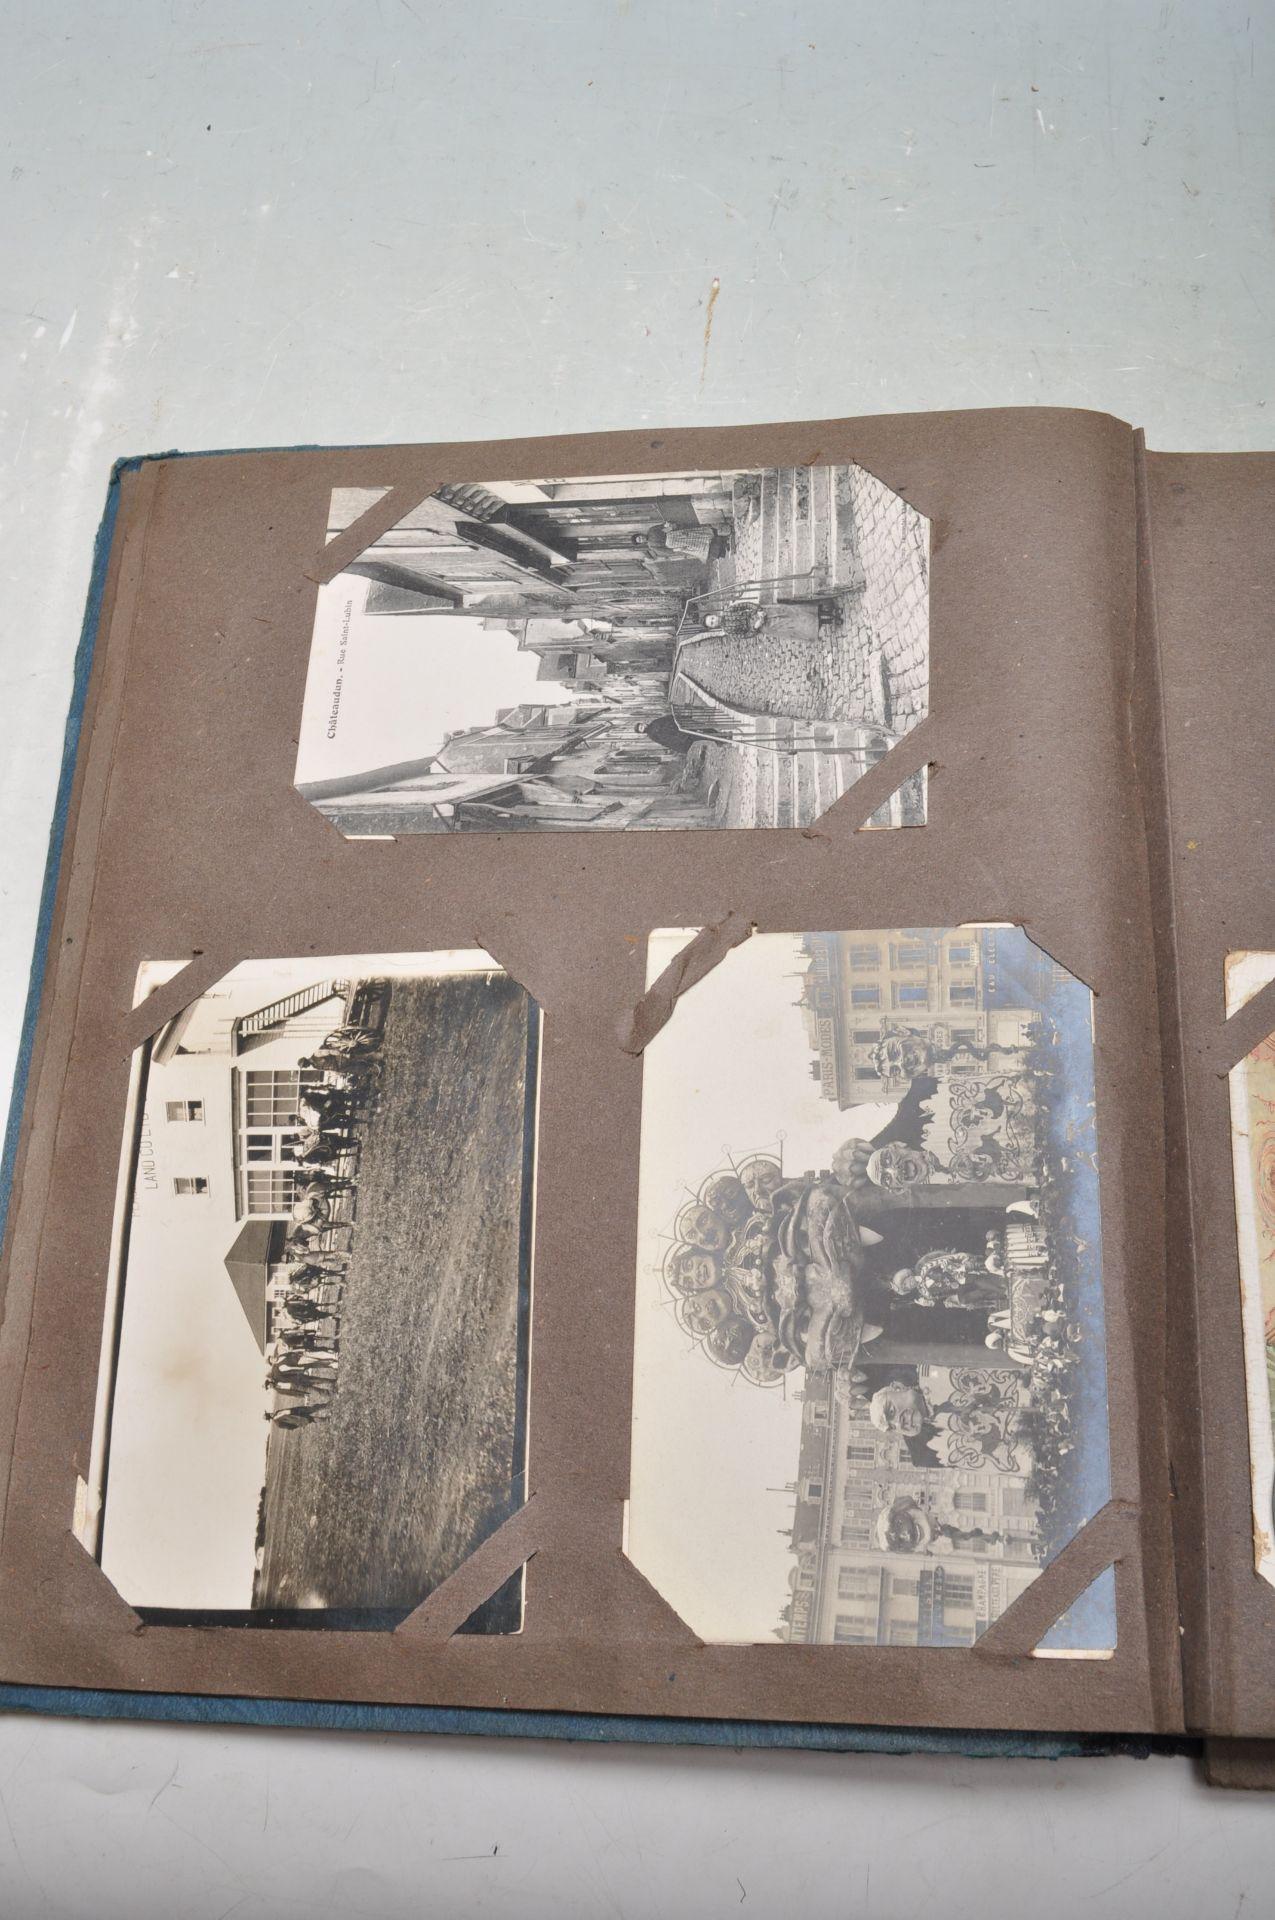 ALBUM OF FOREIGN POSTCARDS - ALL CIRCA WW1 PERIOD - Bild 7 aus 23